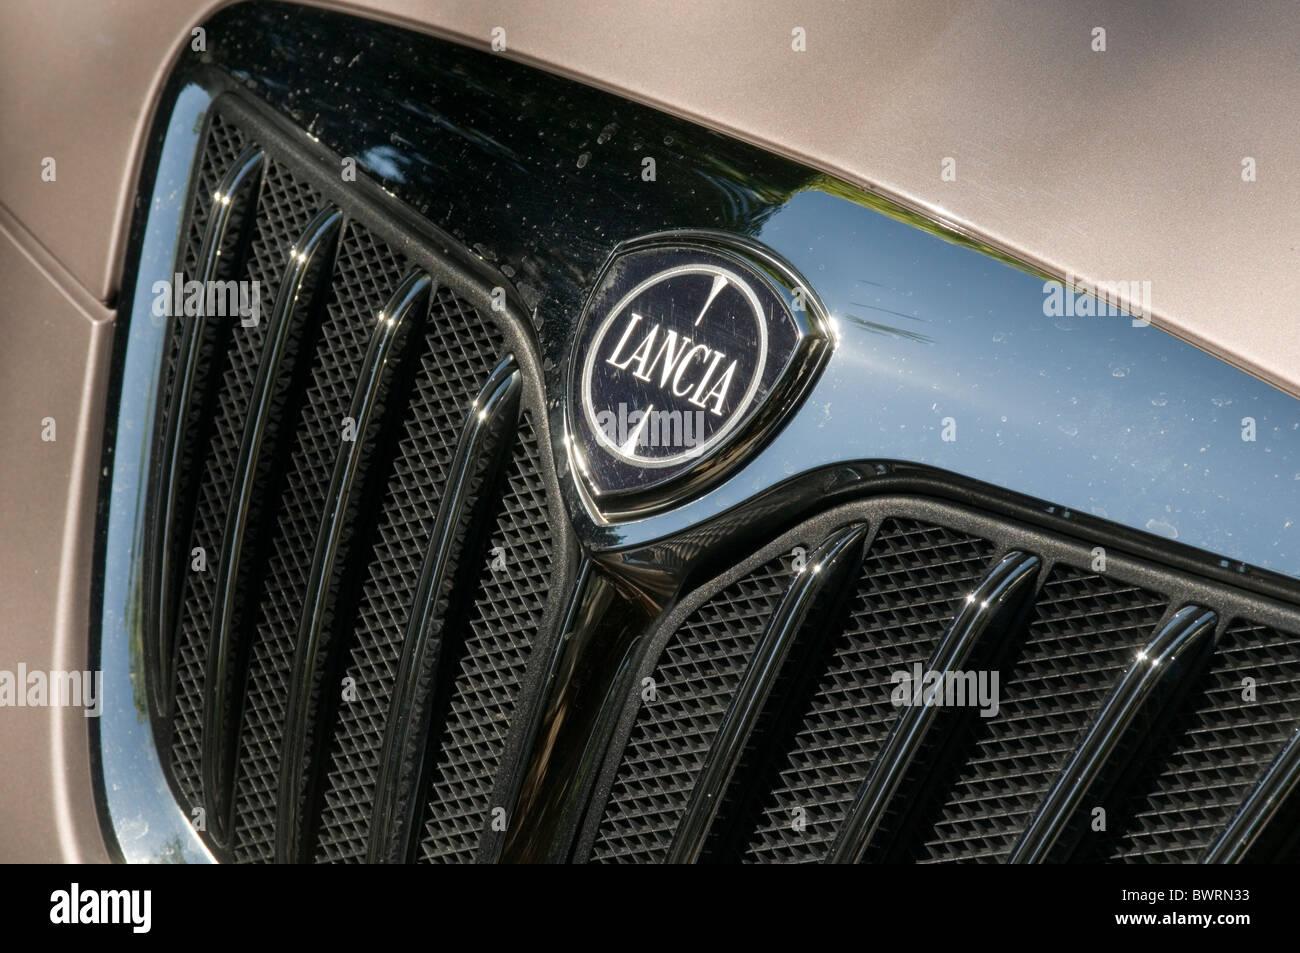 lancia car cars badges logo logos badges hood bonnet grill brand brands branding Italian italy general motors gm - Stock Image